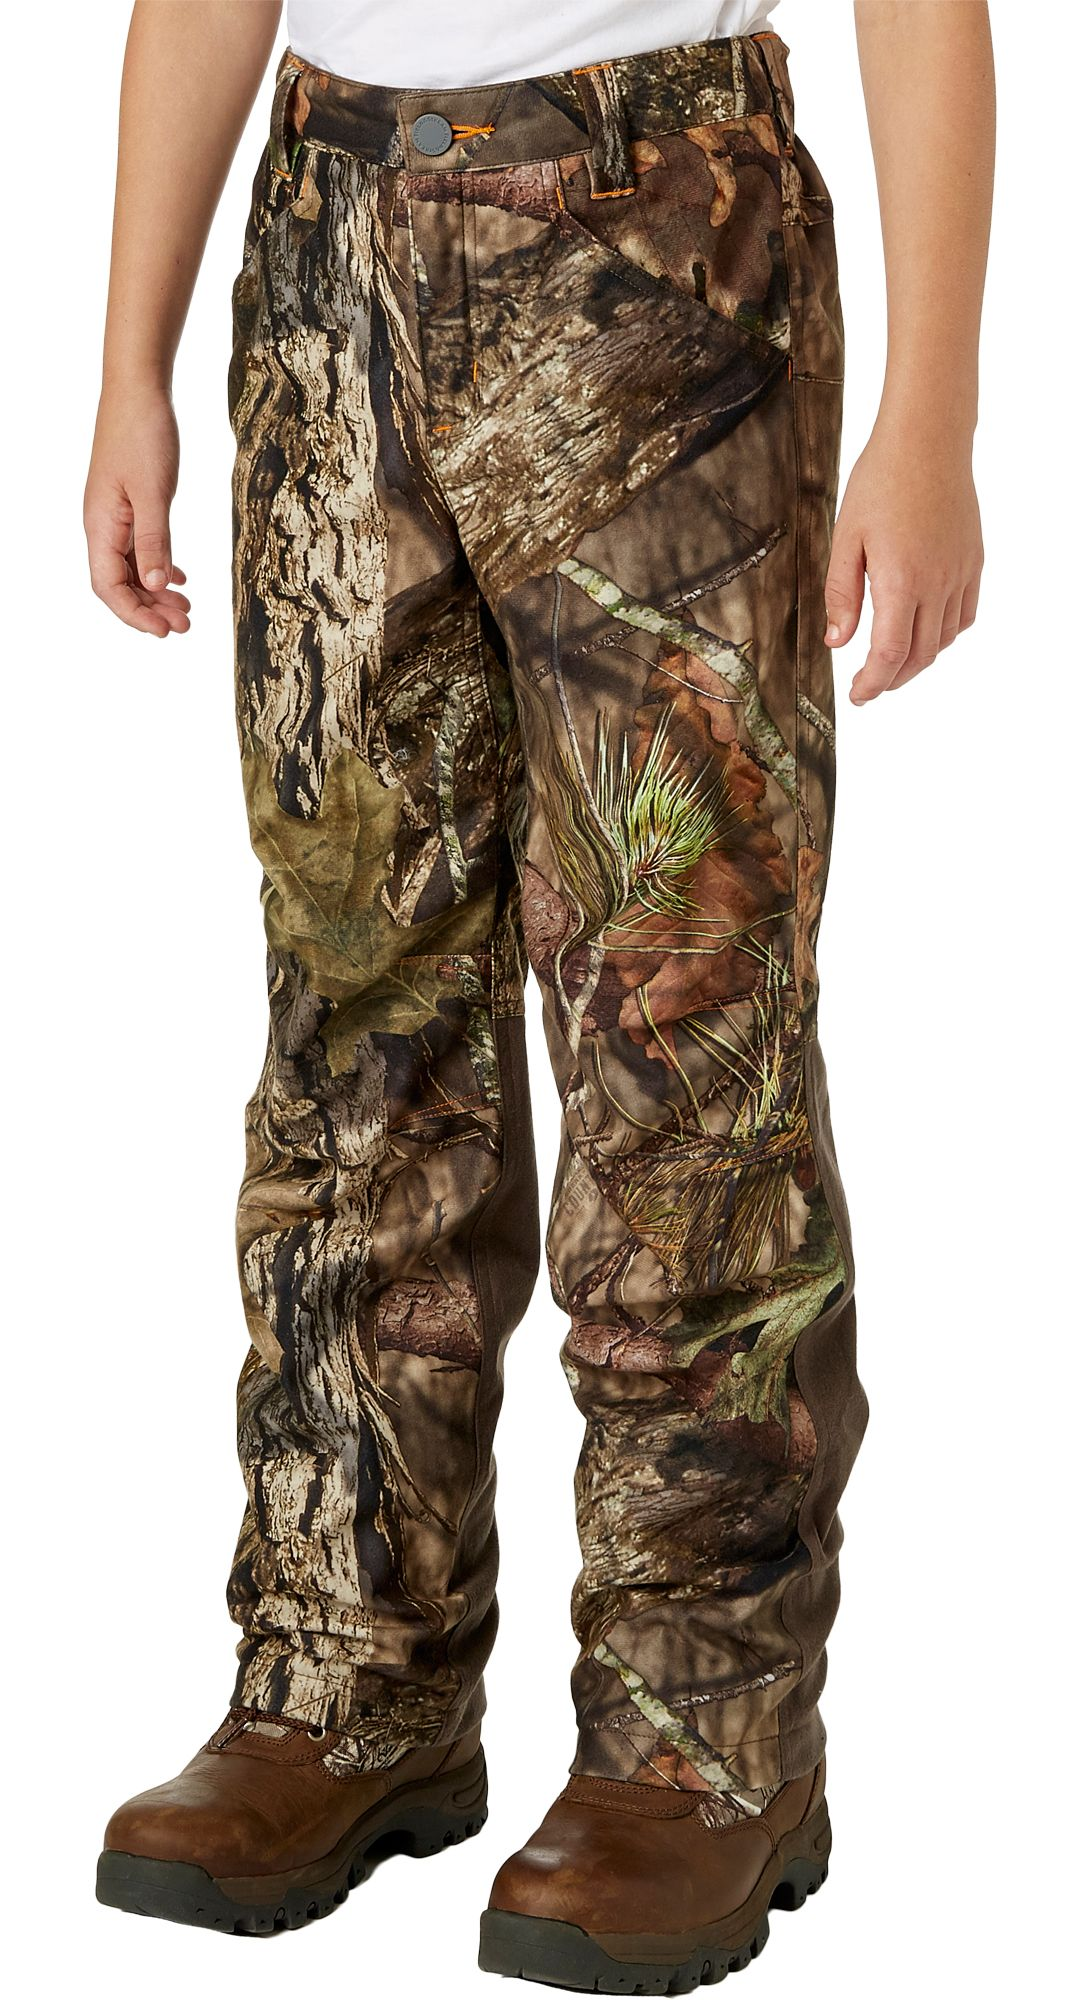 a06f2b080455e Field & Stream Youth Every Hunt Hunting Pants | Field & Stream